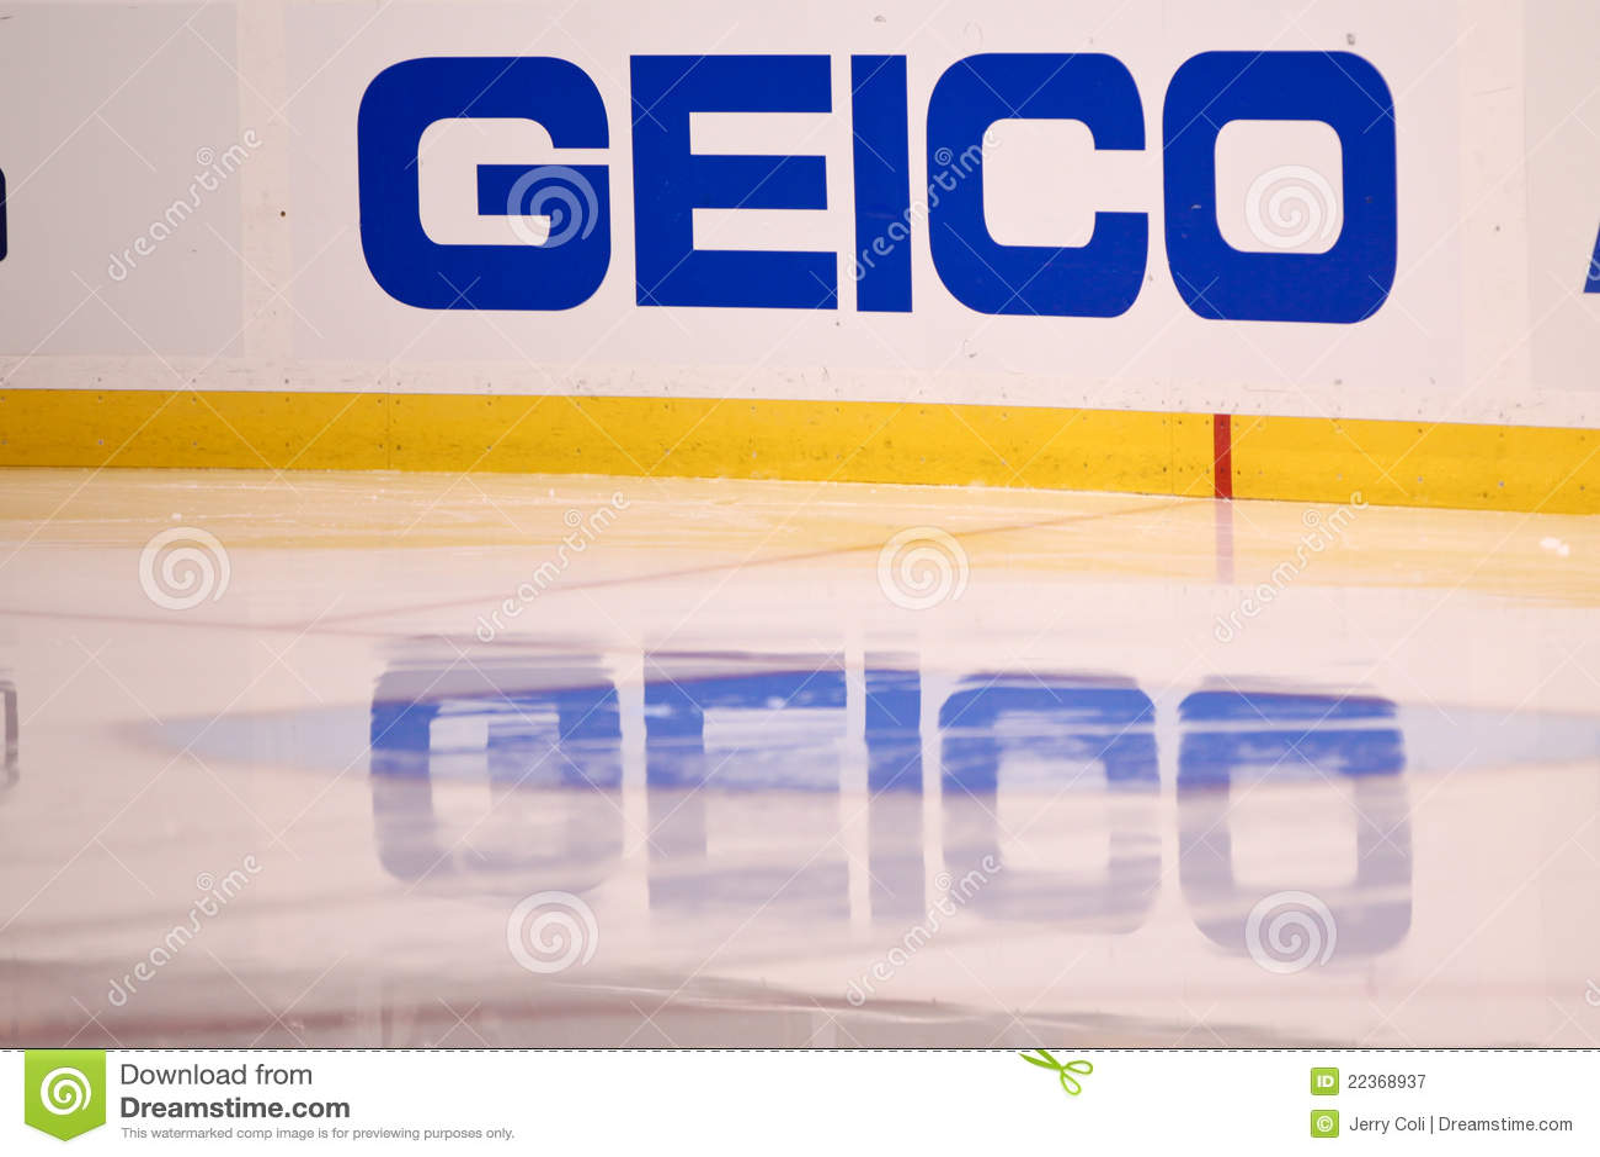 Geico Car Insurance Dasher Editorial Photography Image